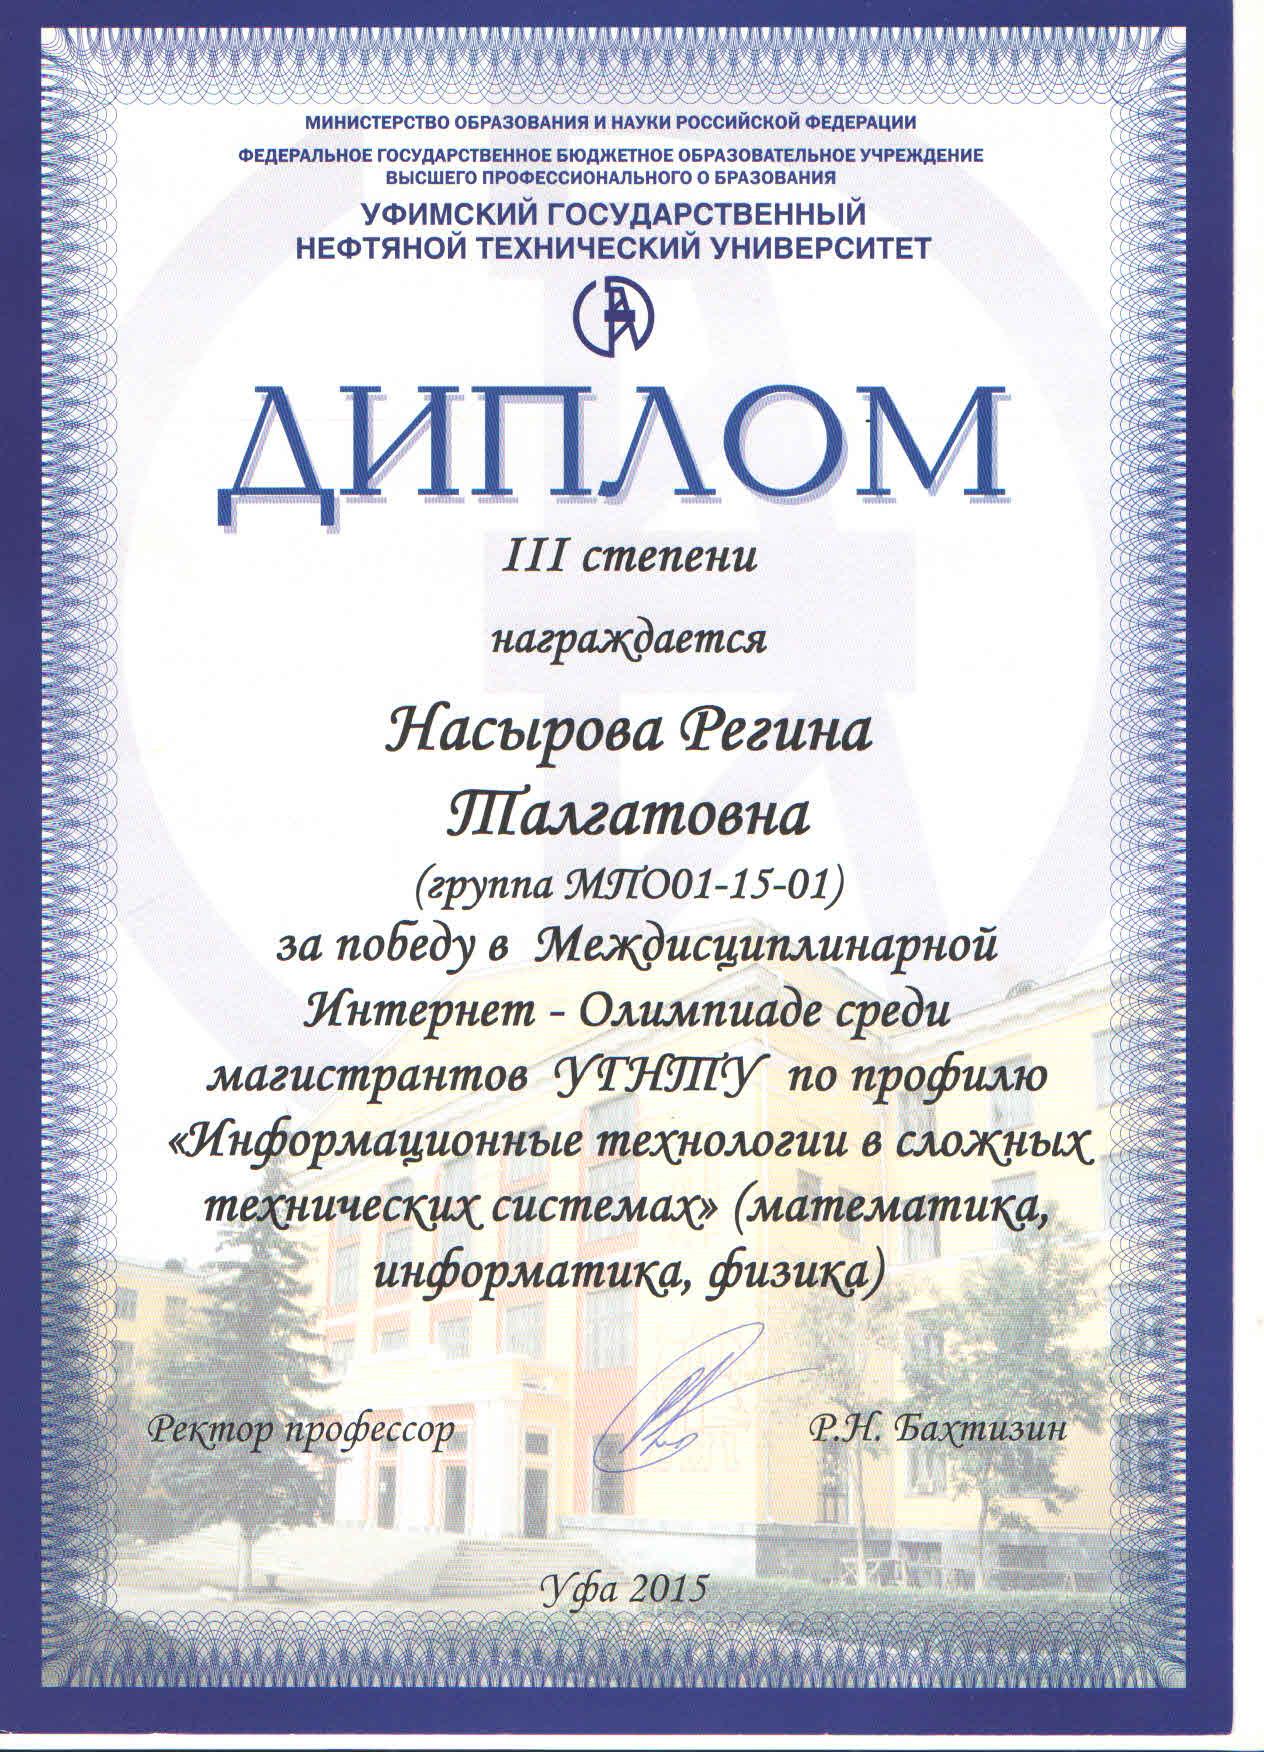 Насырова Регина (МПО01-15-01), #КафедраВТИК, #ФАПП, #ВТИК, #УГНТУ